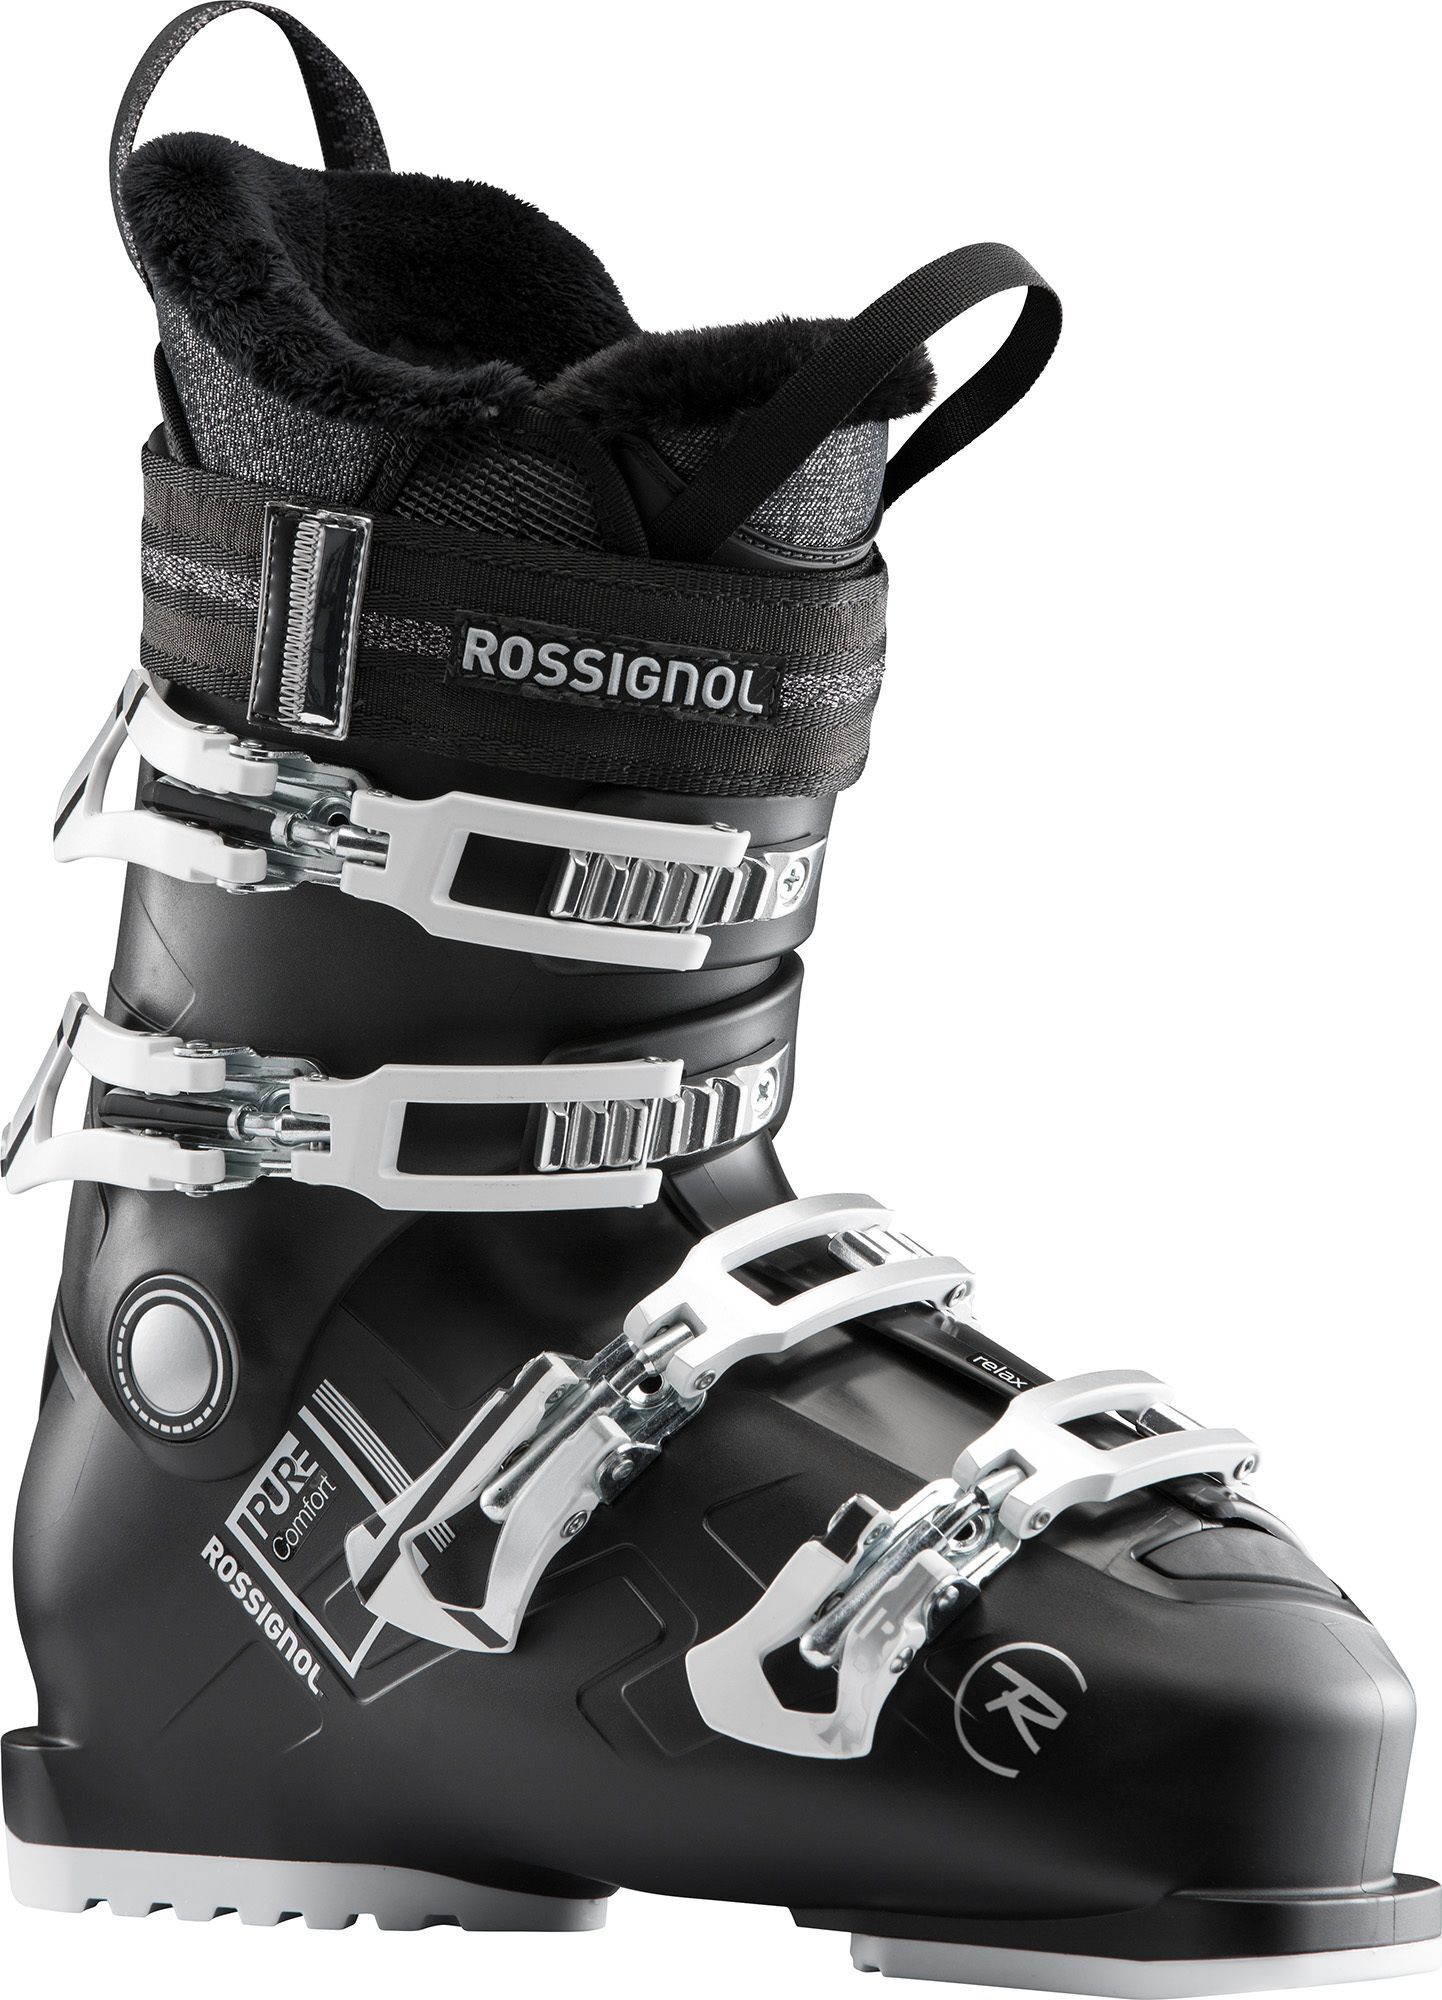 Rossignol ski cipele PURE COMFORT 60 - BLACK